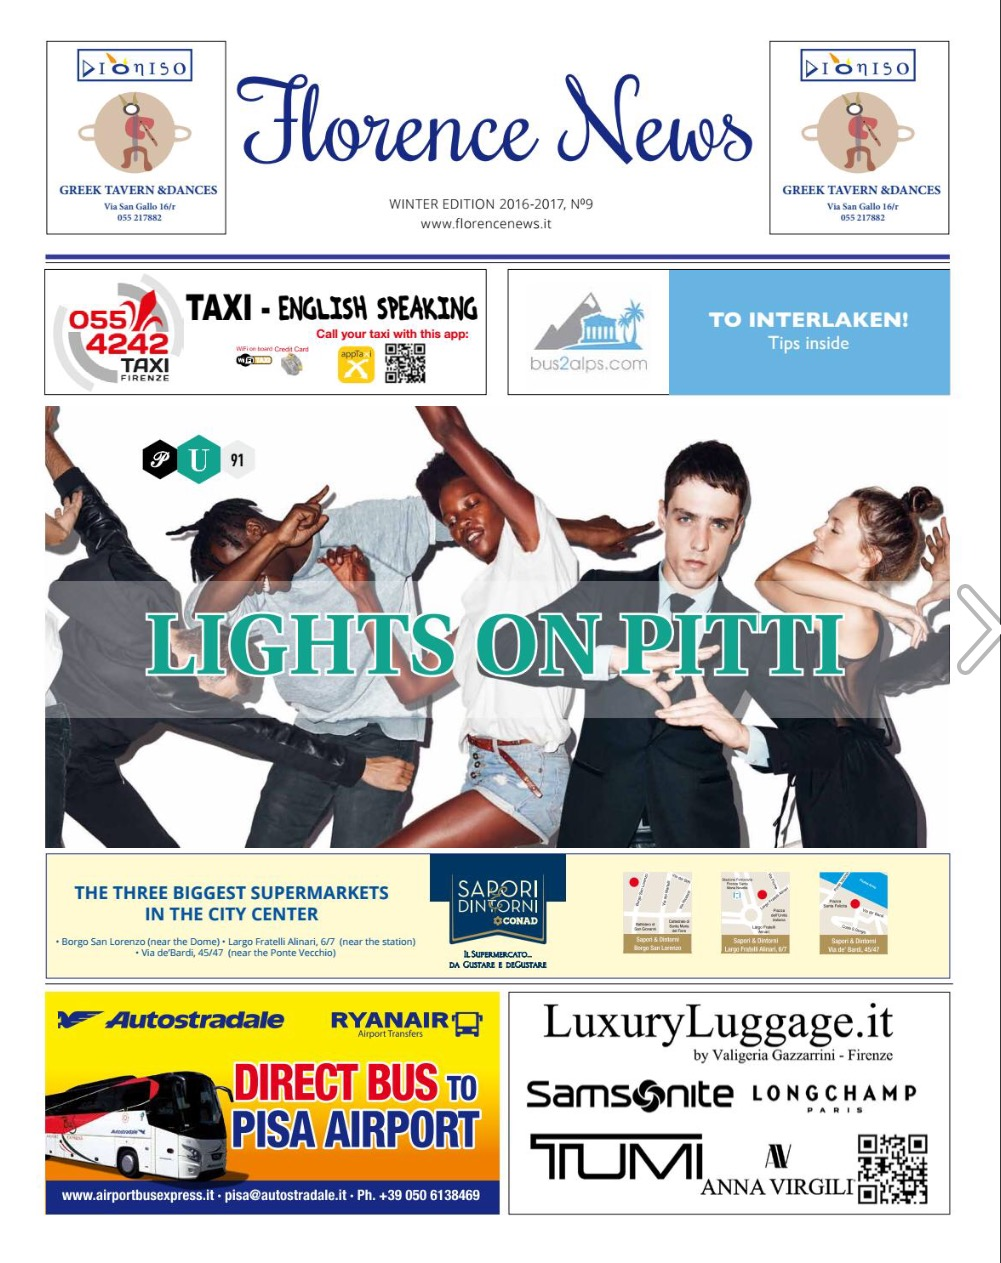 copertina-florence-news-n9